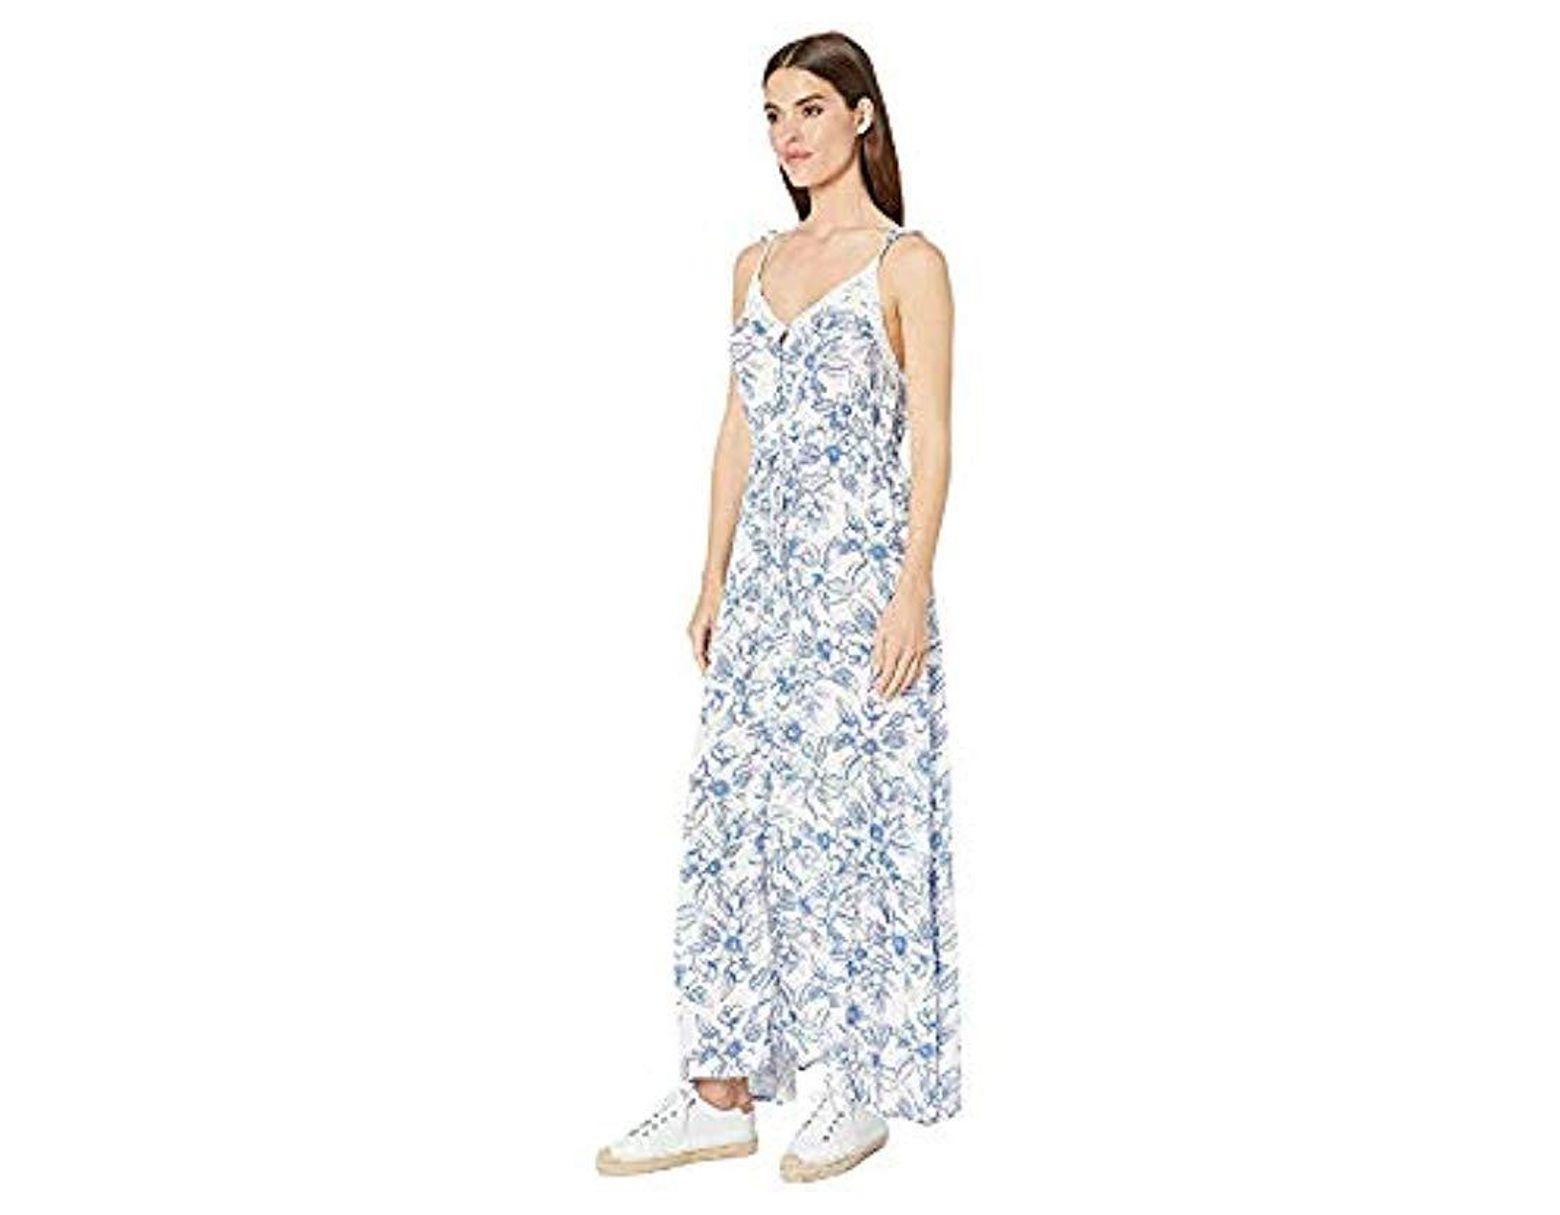 c4cc5a67f5c Roxy Hot Summer Lands Long Dress in Blue - Lyst